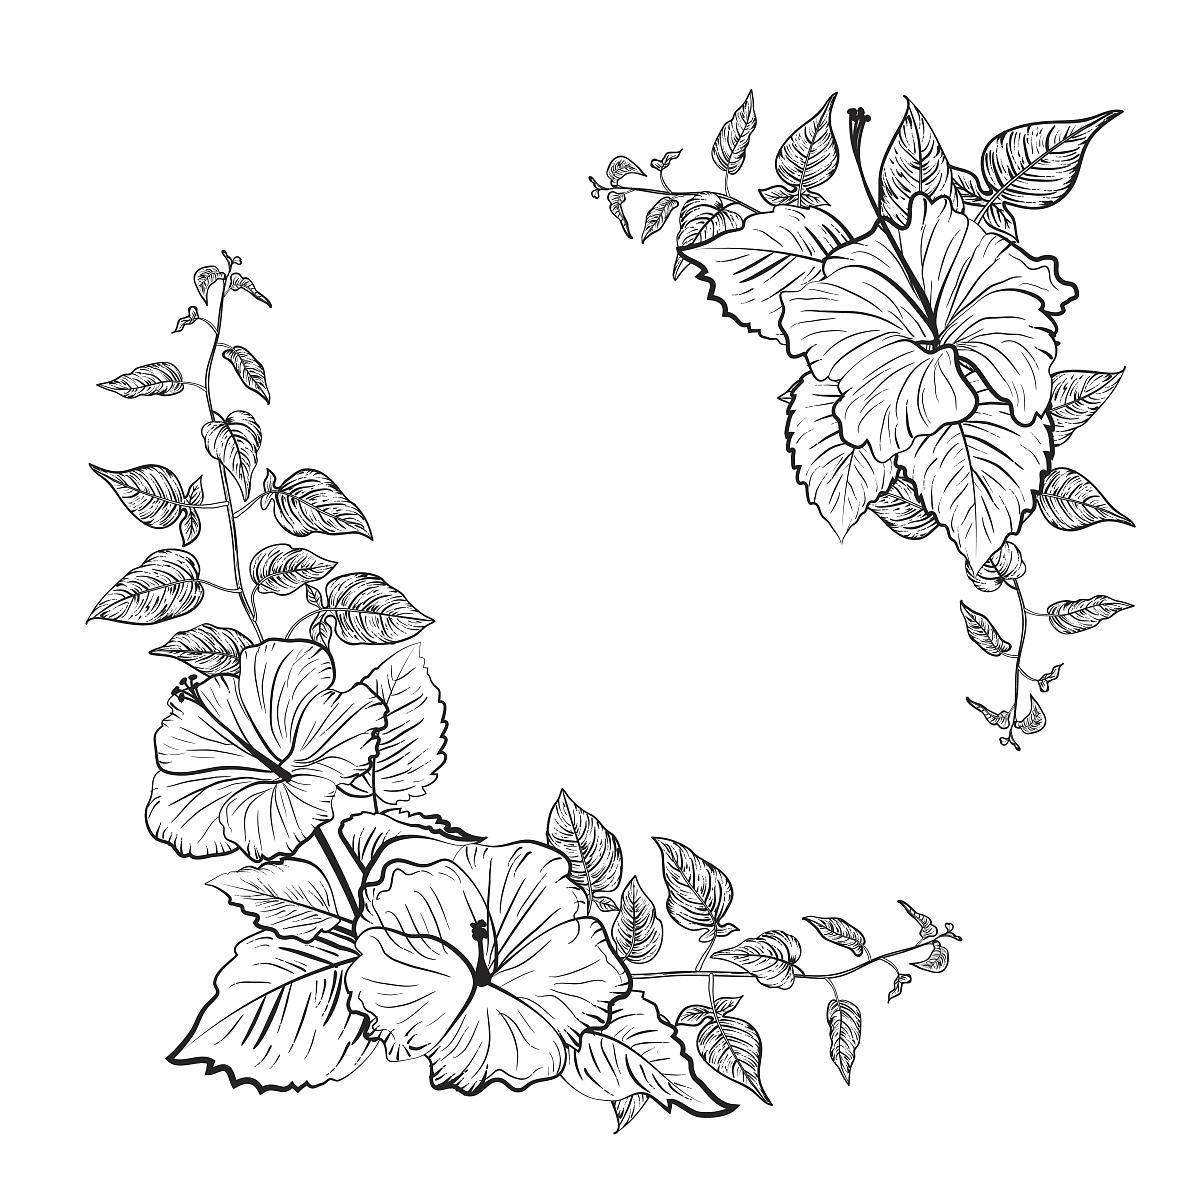 xongjiaodetupian_梅花边框图片梅花图片素描图片